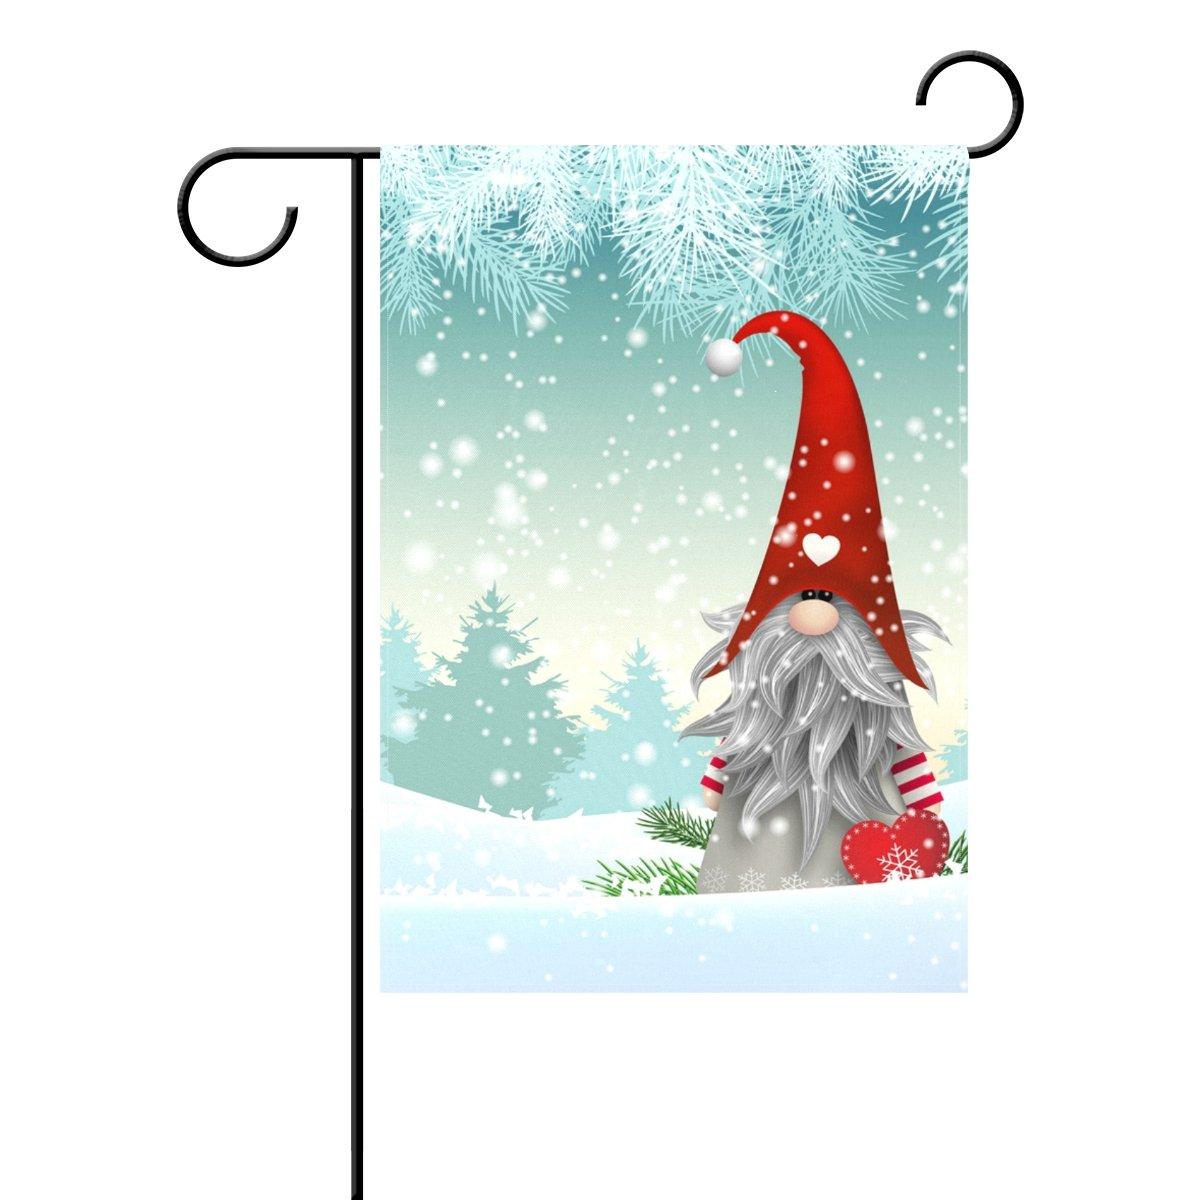 ALAZA Duble Sided Cartoon Winter Christmas White World Snow and Fir Tree Polyester Garden Flag Banner 12 x 18 Inch for Outdoor Home Garden Flower Pot Decor